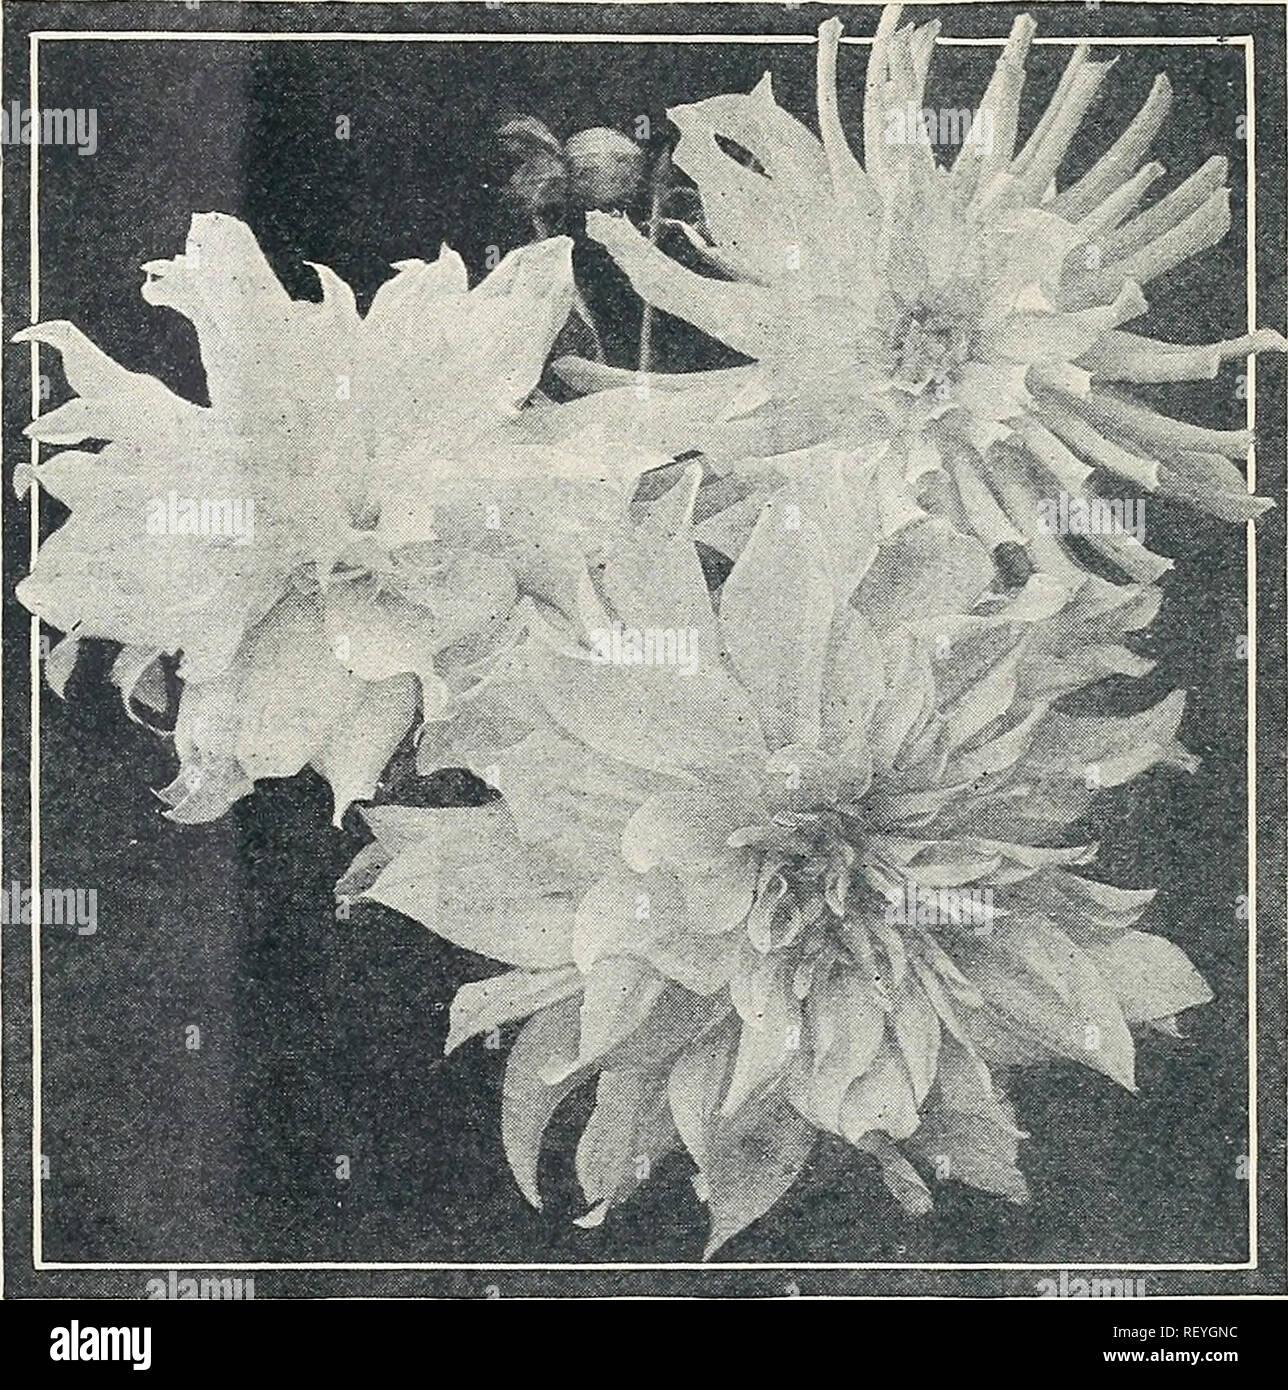 Dreer S Novelties And Specialties 1934 Flowers Seeds Catalogs